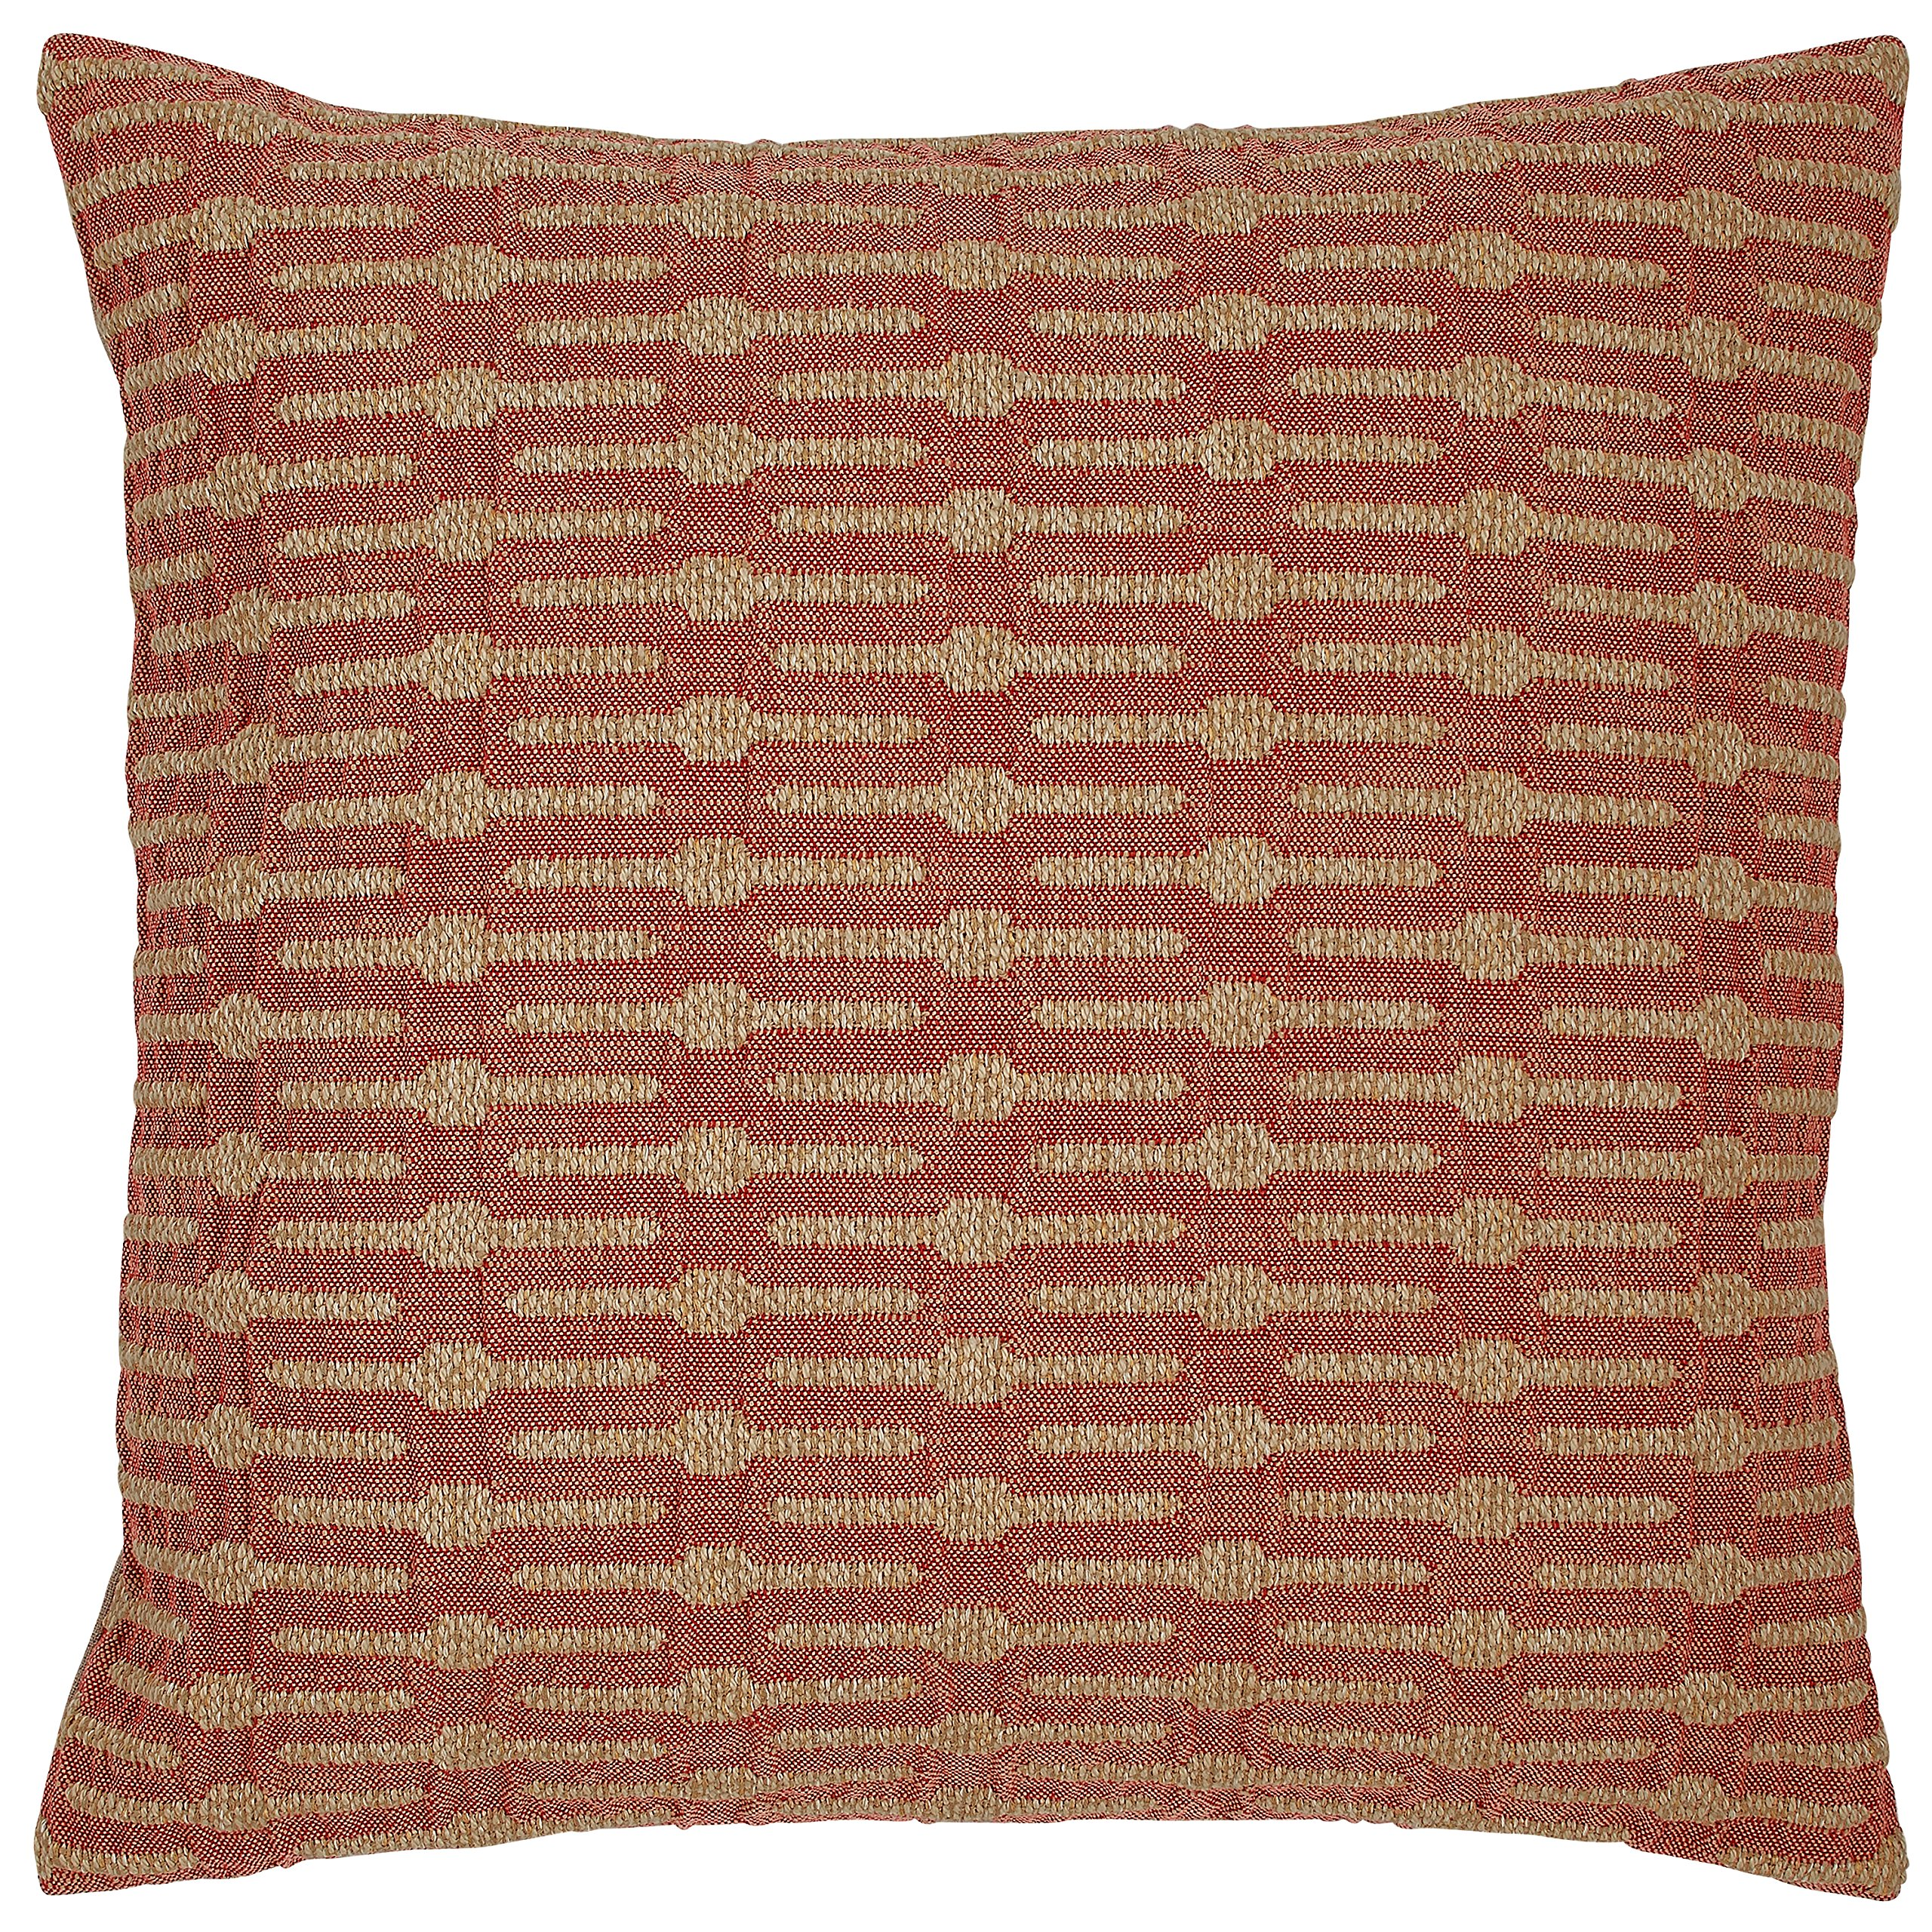 Stone & Beam Mid-Century Modern Geometric Decorative Throw Pillow, 20'' x 20'', Brick Red by Stone & Beam